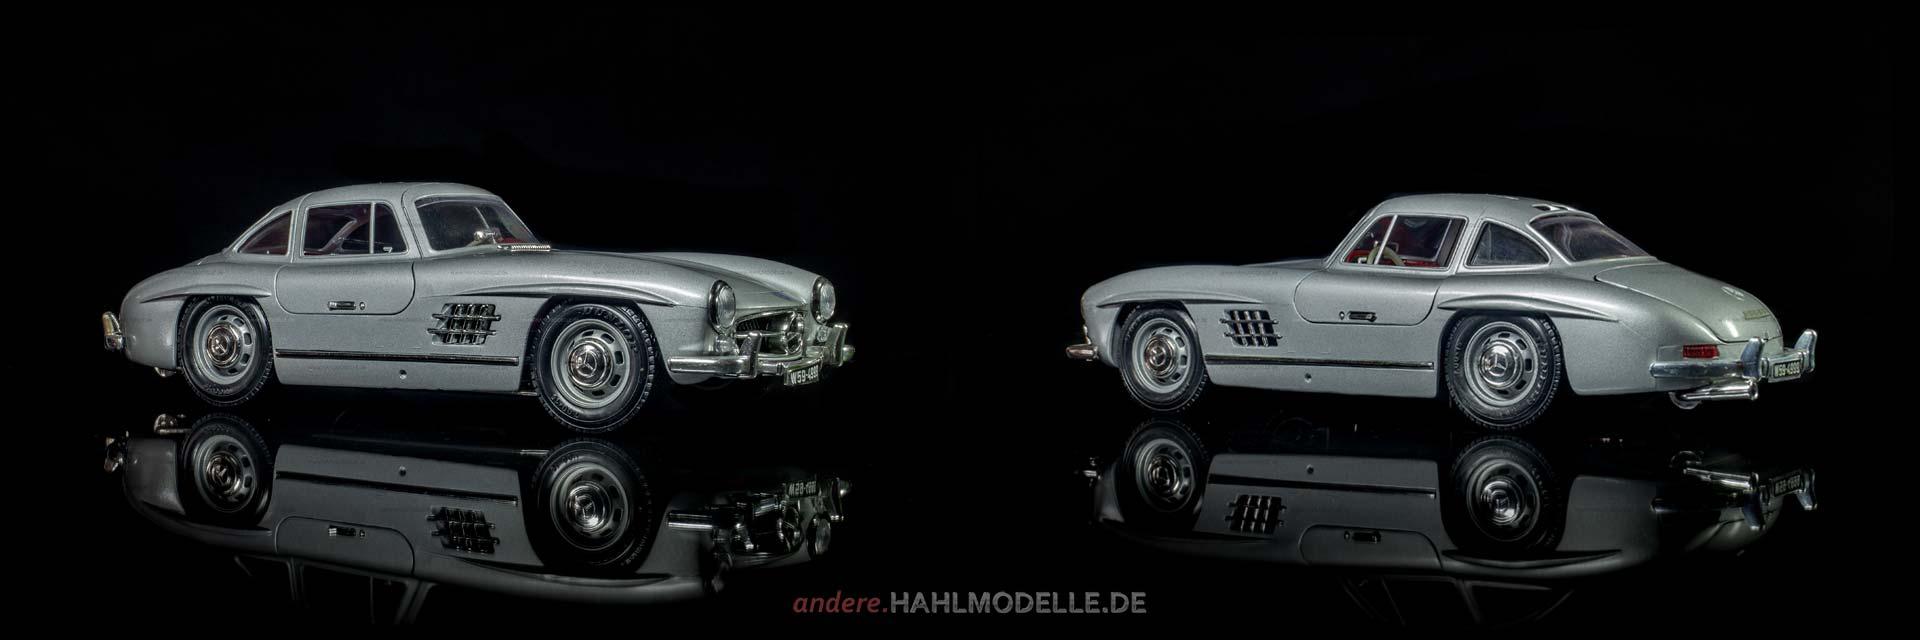 Mercedes-Benz 300 SL (W 198) | Coupé | Bburago | www.andere.hahlmodelle.de